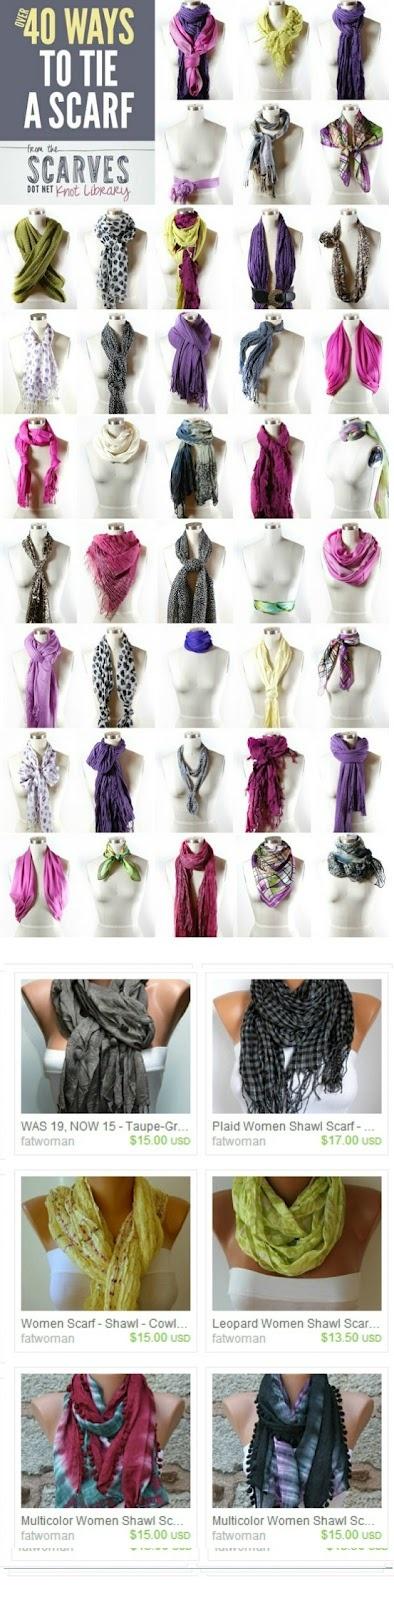 So Many Ways to Tie A Scarf...my Fav. wardrobe accessory in the Fall  Winter!